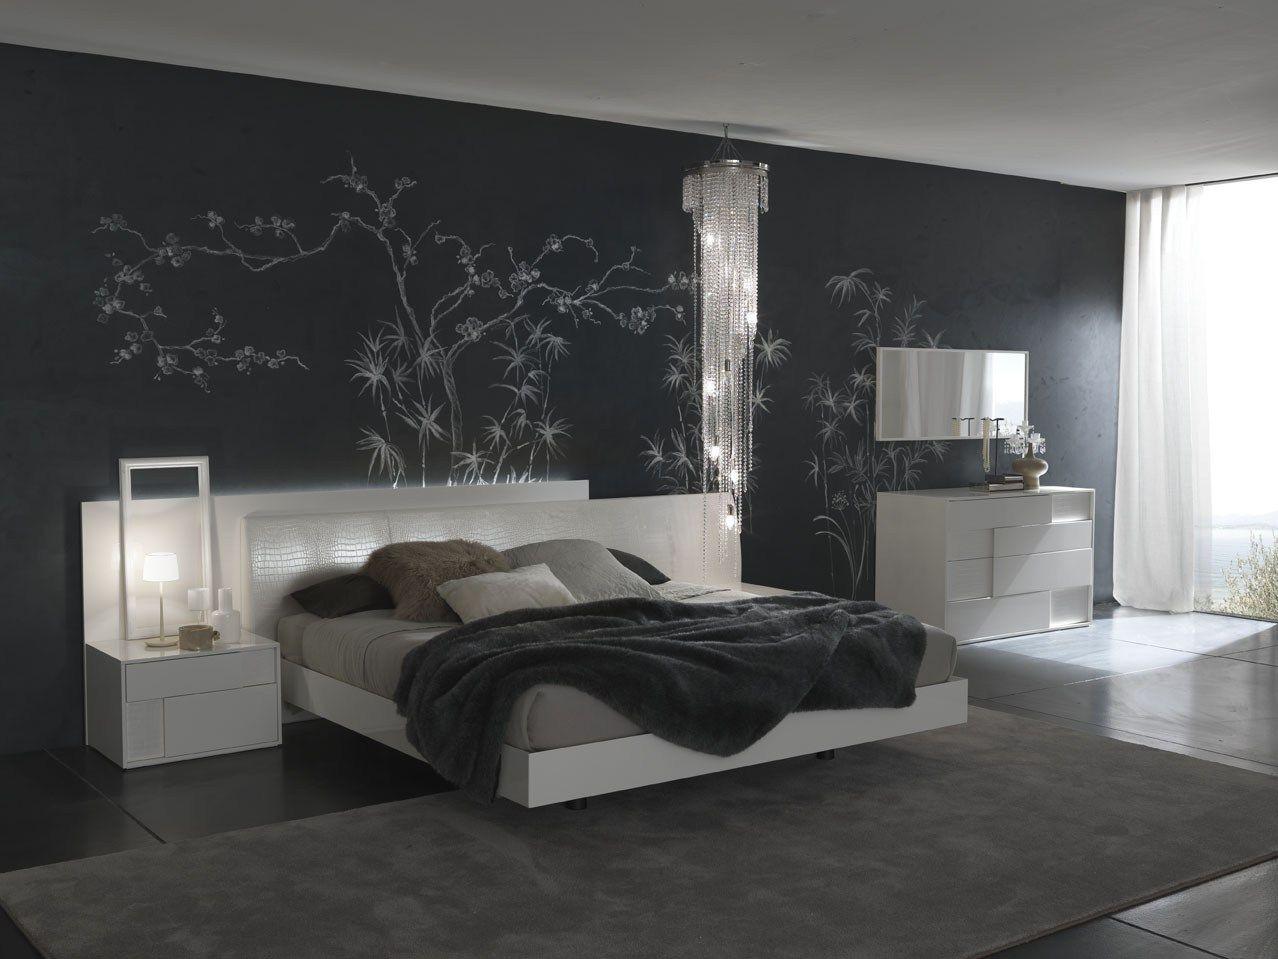 Accent wall paint ideas bedroom  bedroom decorating ideas evinco metallic accents decor fabric tiles